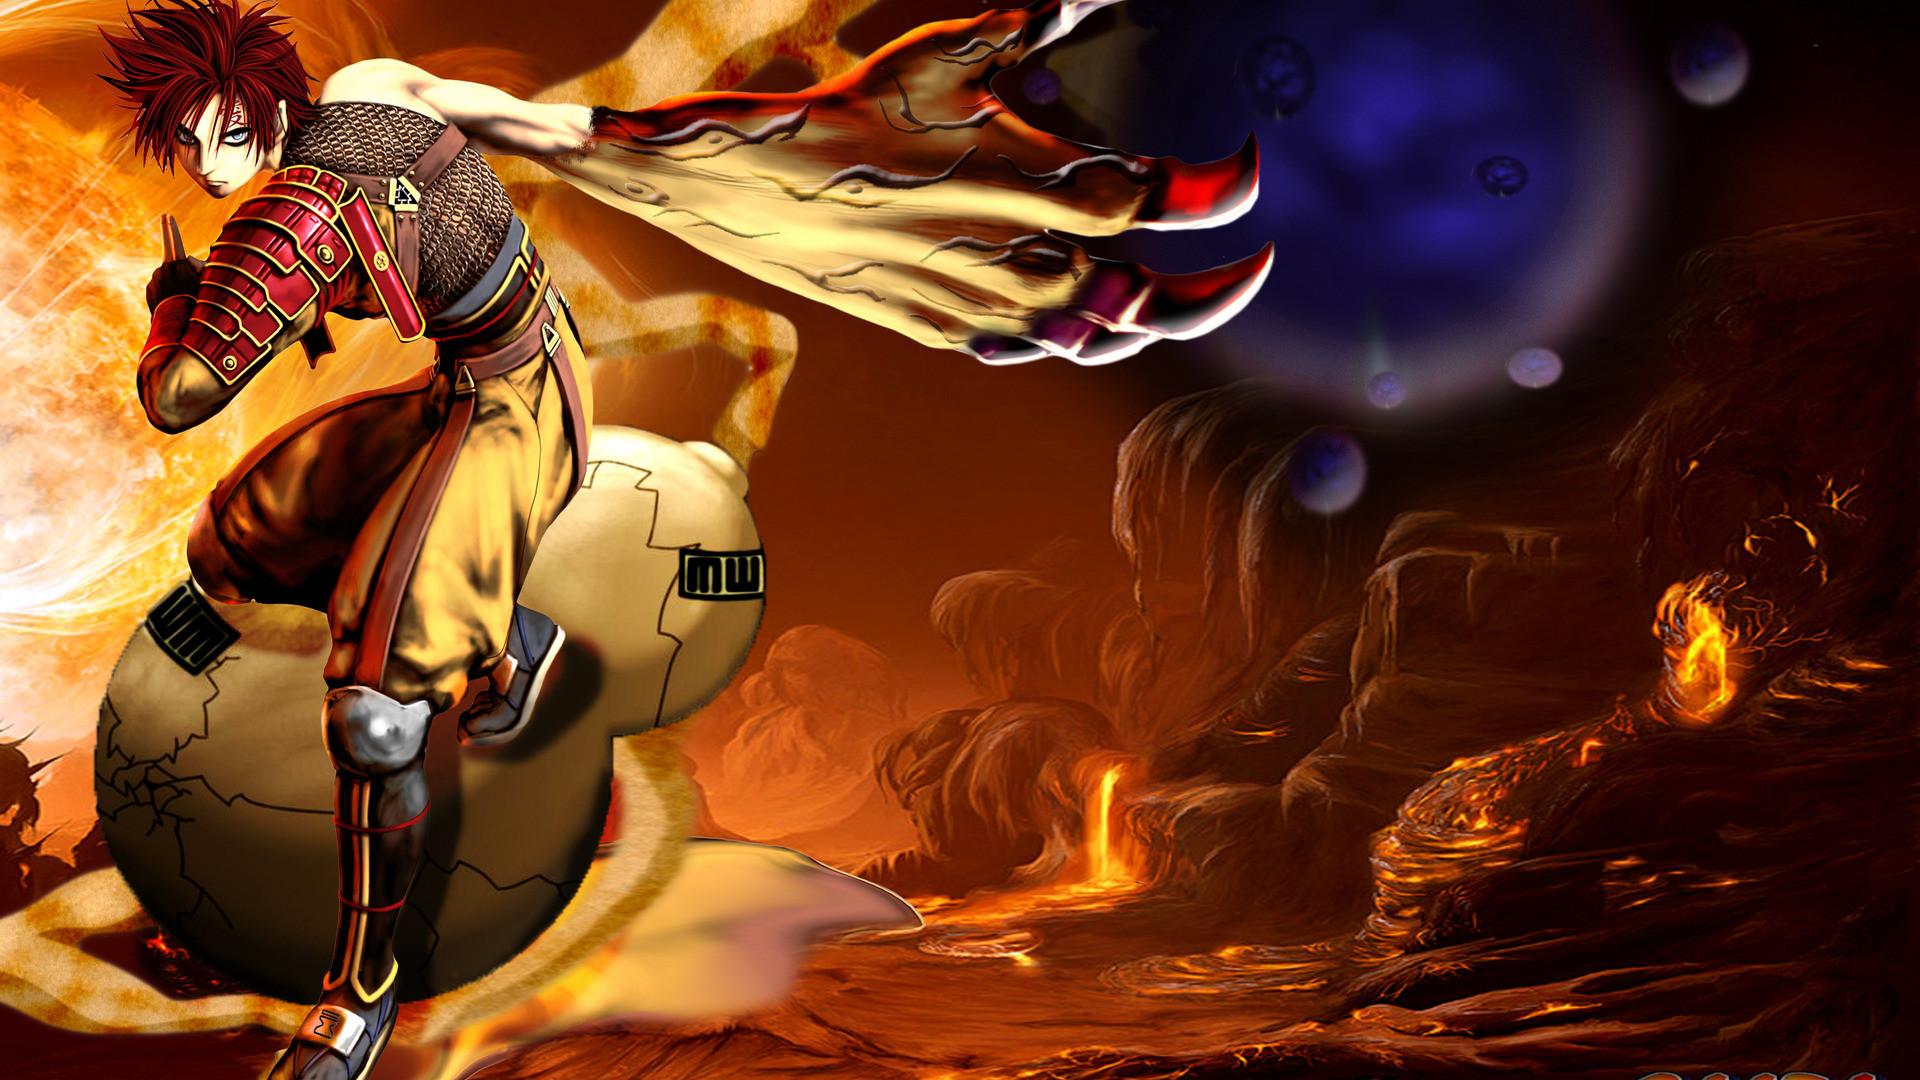 HD Naruto Wallpapers Download Free | HD Wallpapers | Pinterest | Hd  wallpaper, Wallpaper and Wallpaper downloads